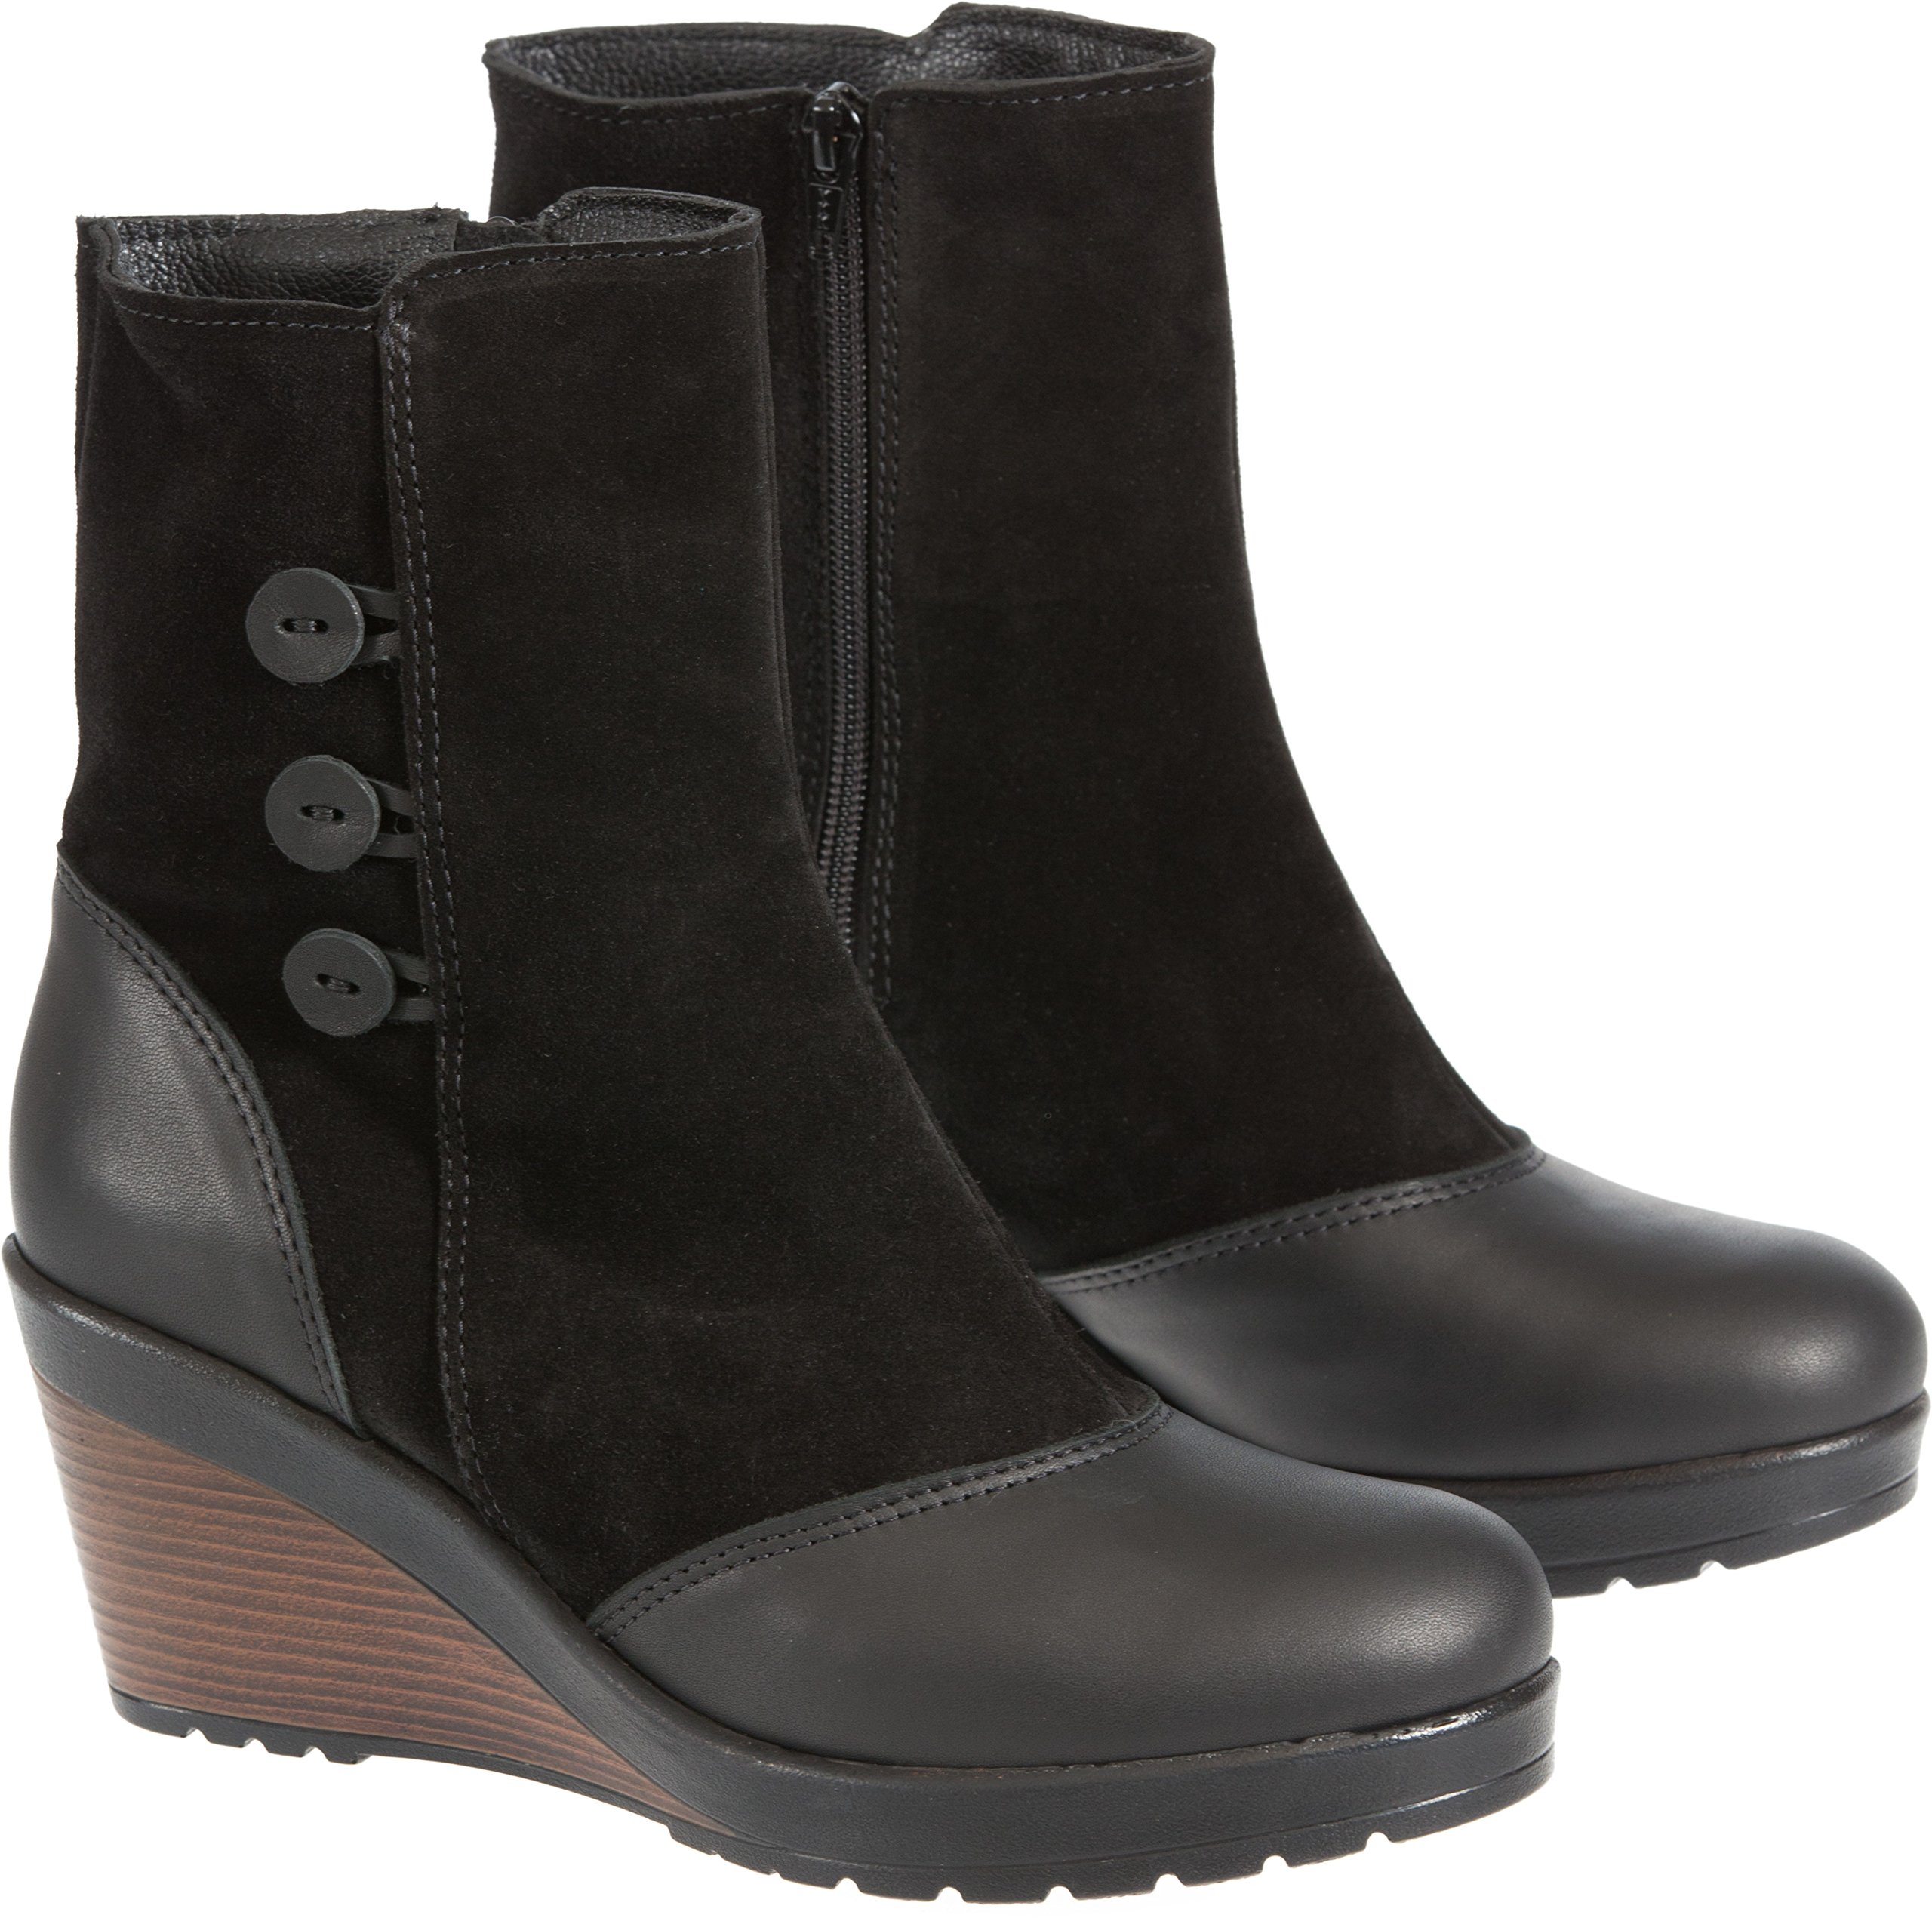 Overland Sheepskin Co. Women's Drew Wool-Lined Waterproof Italian Leather Wedge Boots, Black Leather/Suede, Size EU38